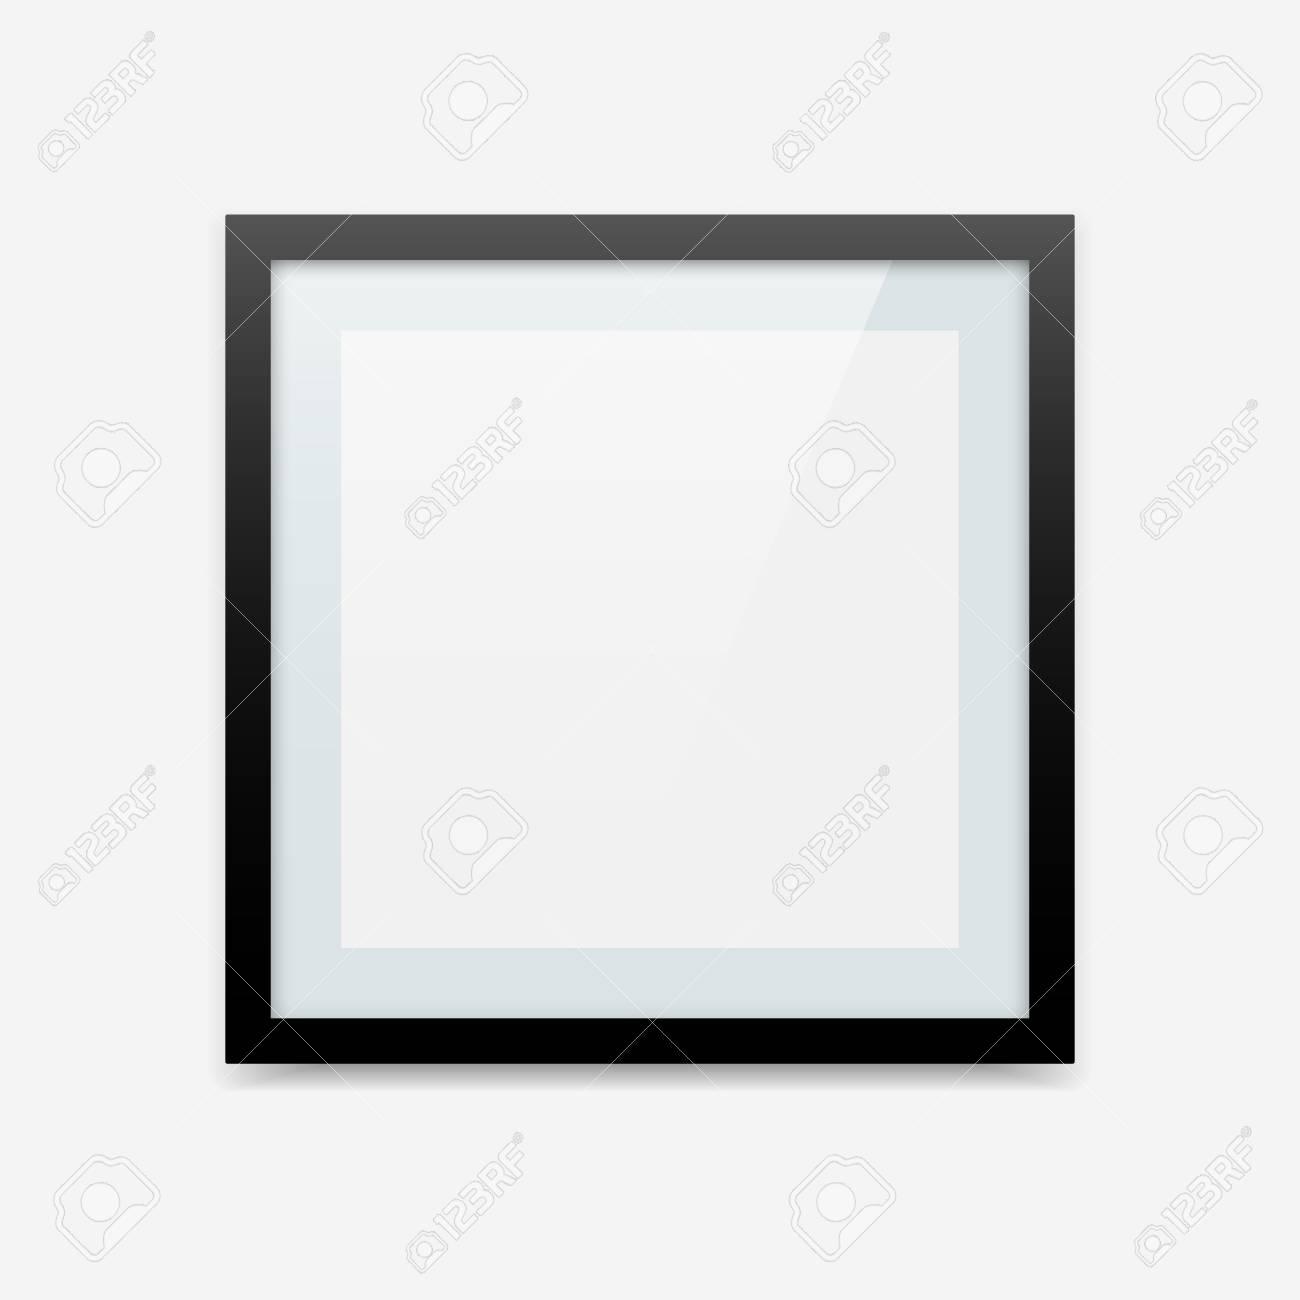 Vektor-Bilderrahmen Des Schwarzen Quadrats Mit Blauem Passepartout ...